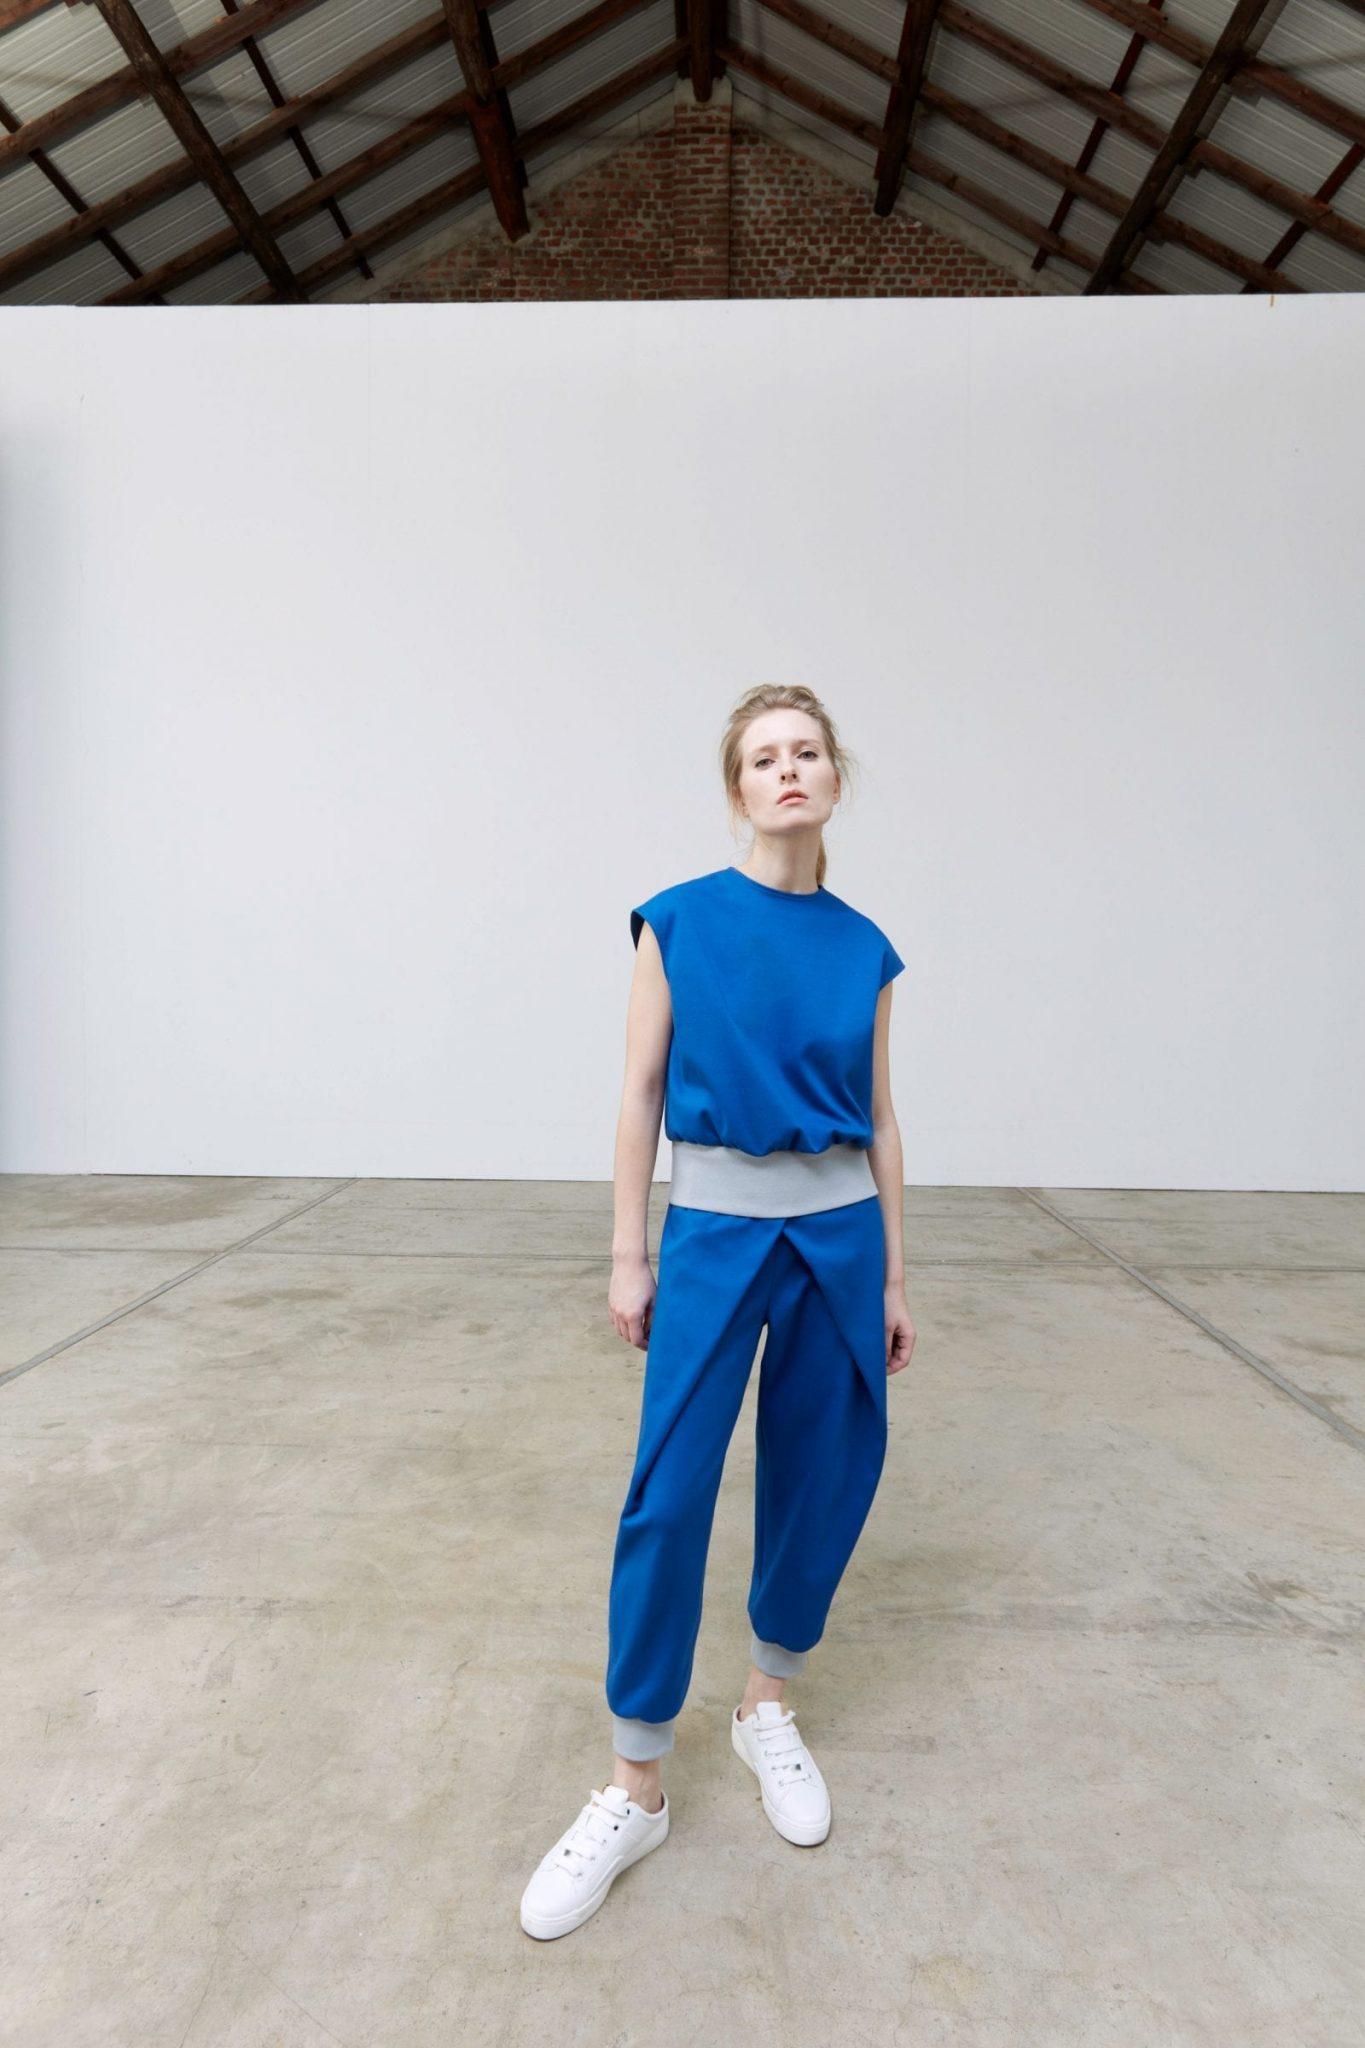 4.-BAV-TAILOR_AW20-ANANTA_shanti-yoga-outfit-1600×2400